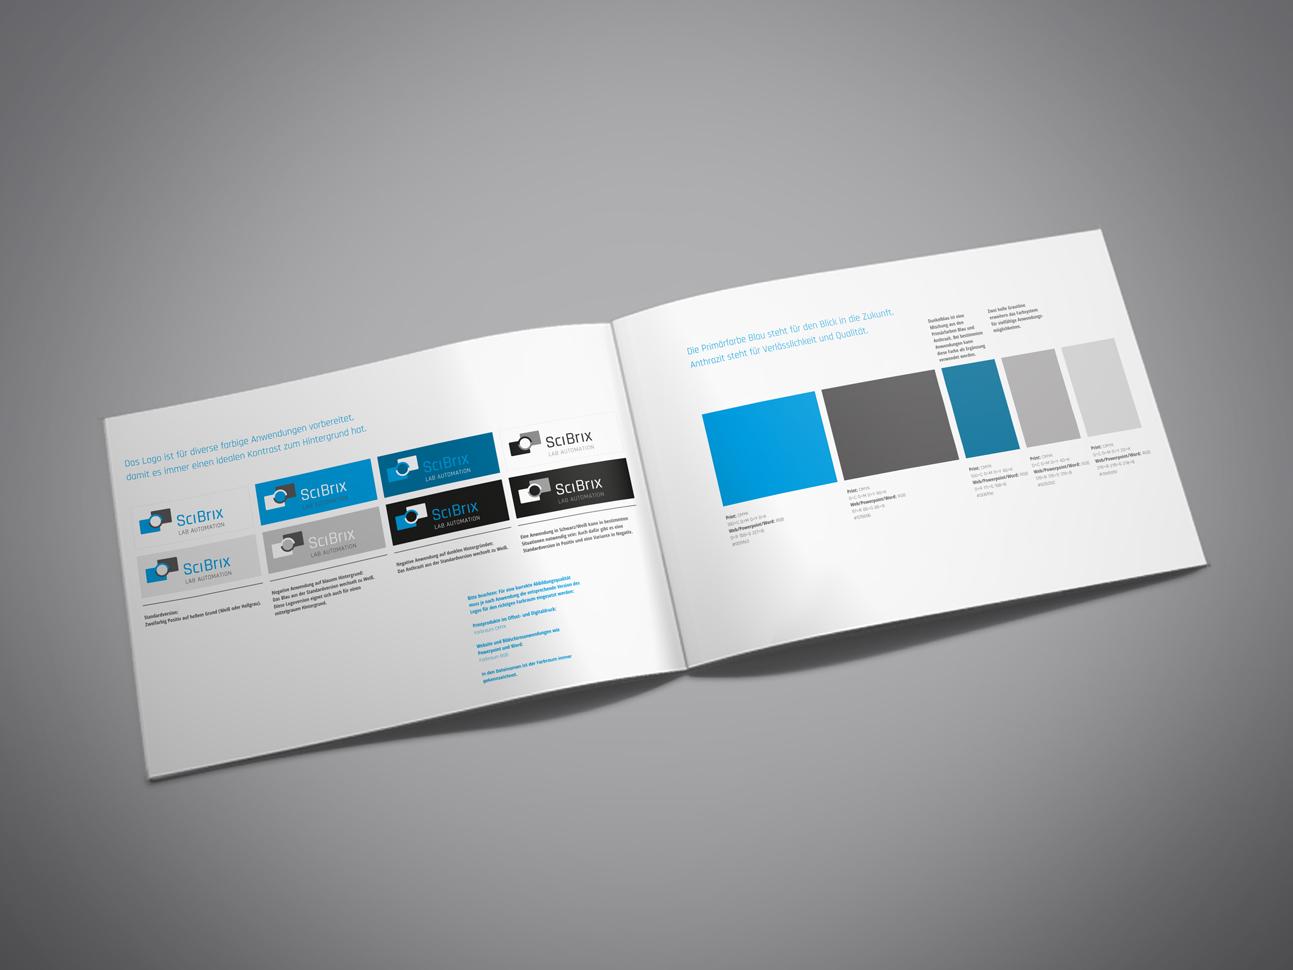 martin_zech_design_corporate_design_SciBrix-lab-automation_styleguide_doppelseite_3